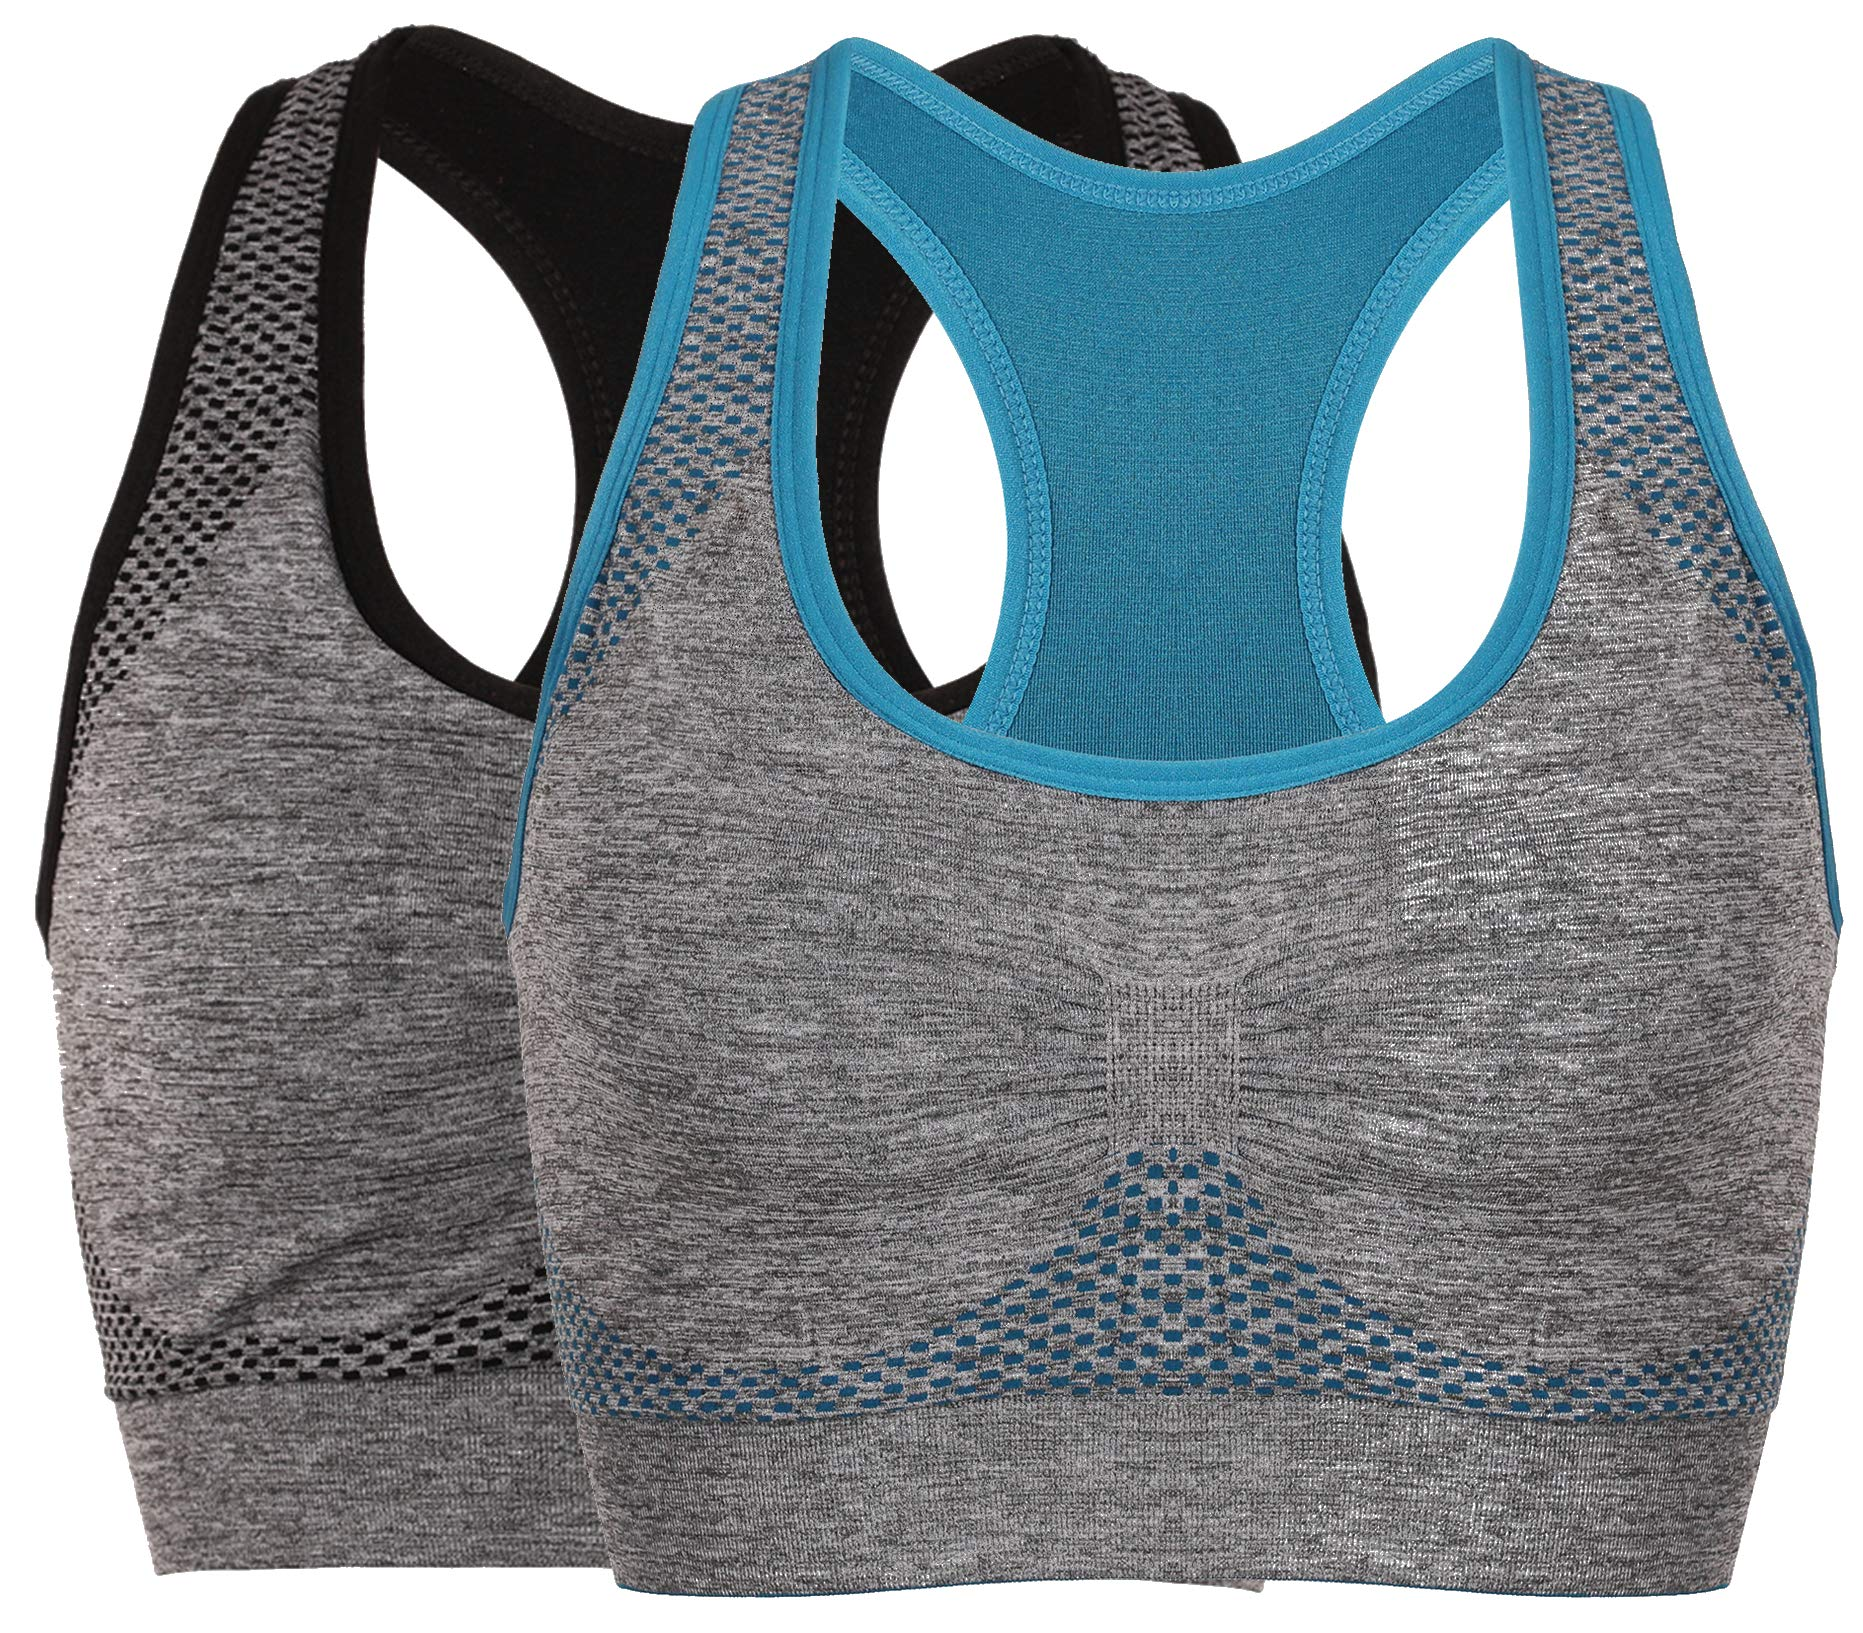 Vermilion Bird Women's Seamless Sports Bra High Impact Pocket Yoga Bras (30A 30B 30C 30D 32A 32B 32C, 2 Pack:Blue Grey)